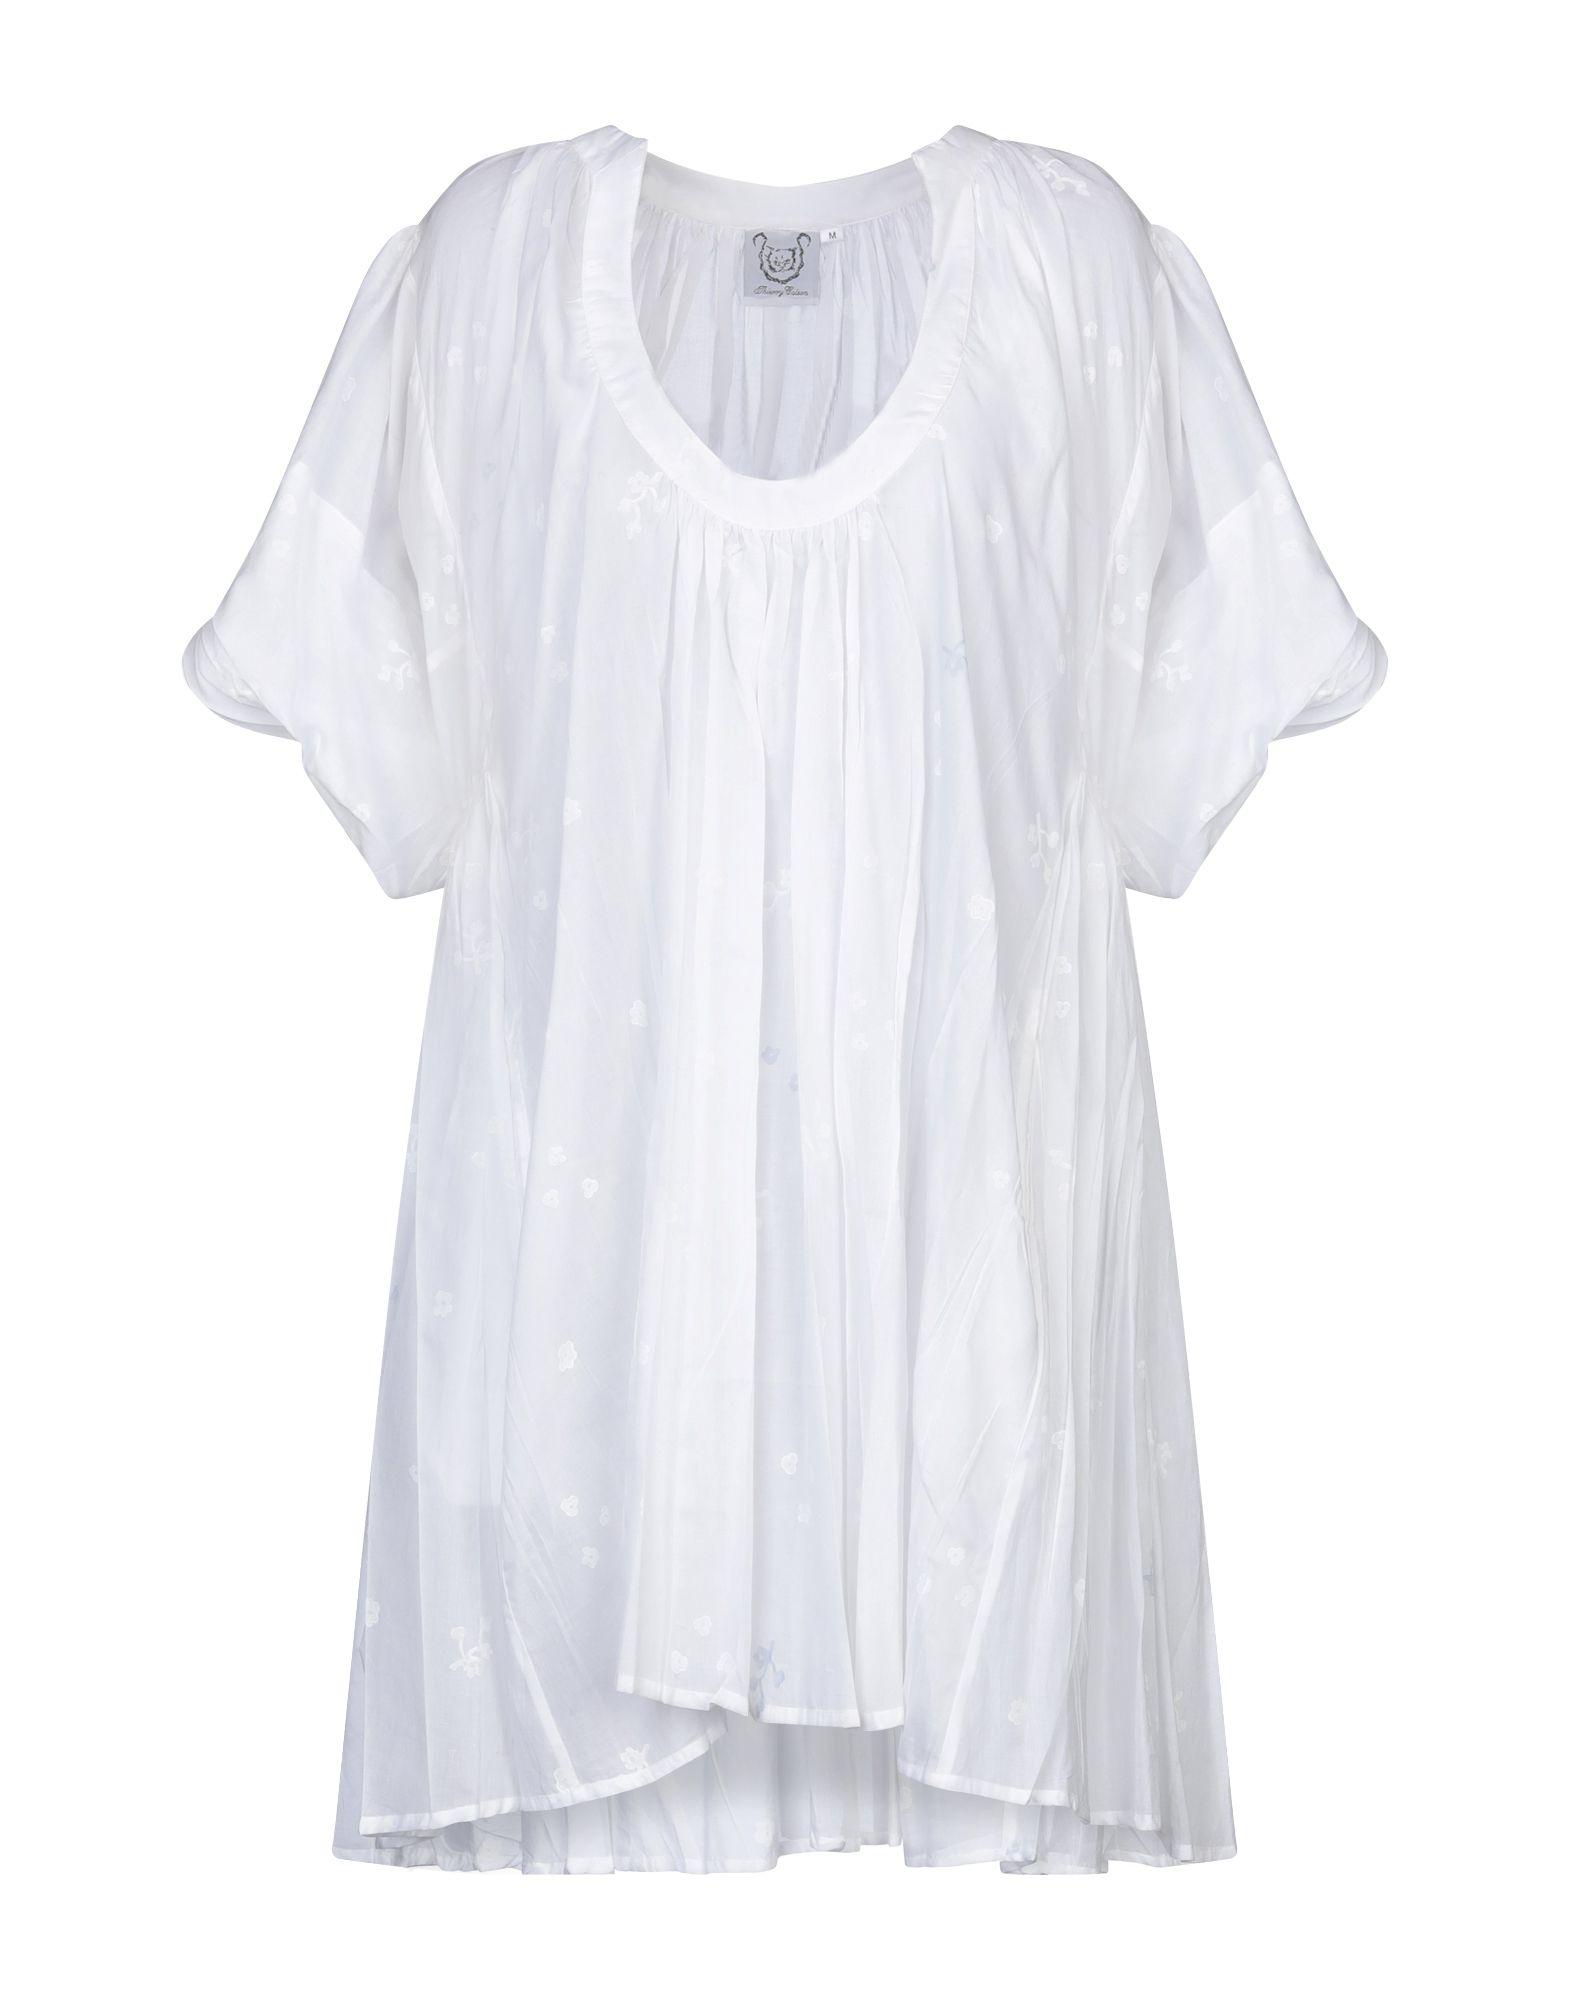 THIERRY COLSON Блузка thierry colson платье длиной 3 4